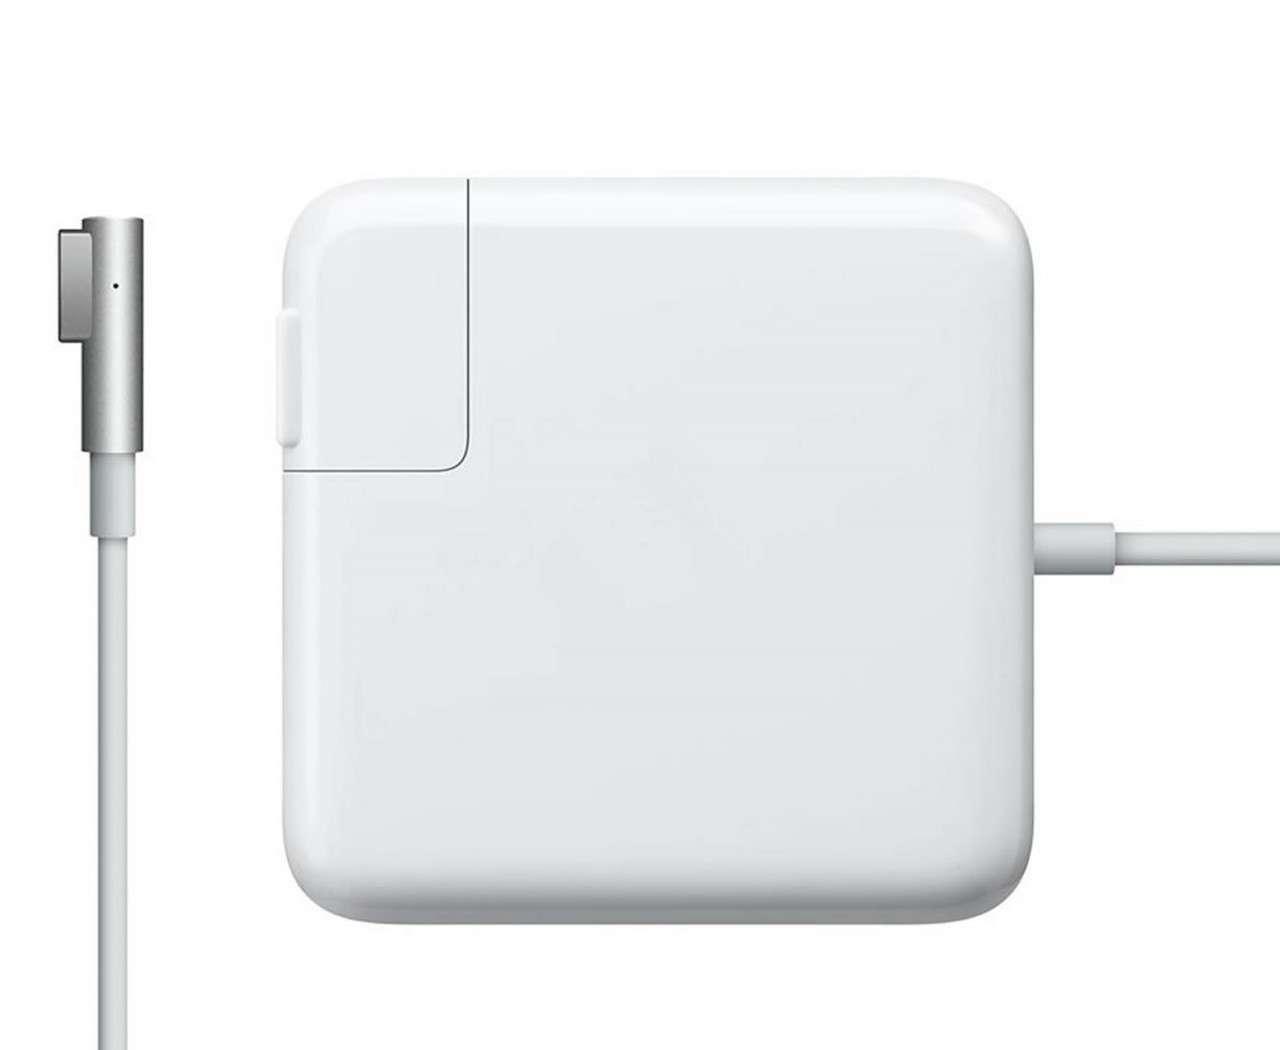 Incarcator Apple MacBook A1342 imagine powerlaptop.ro 2021